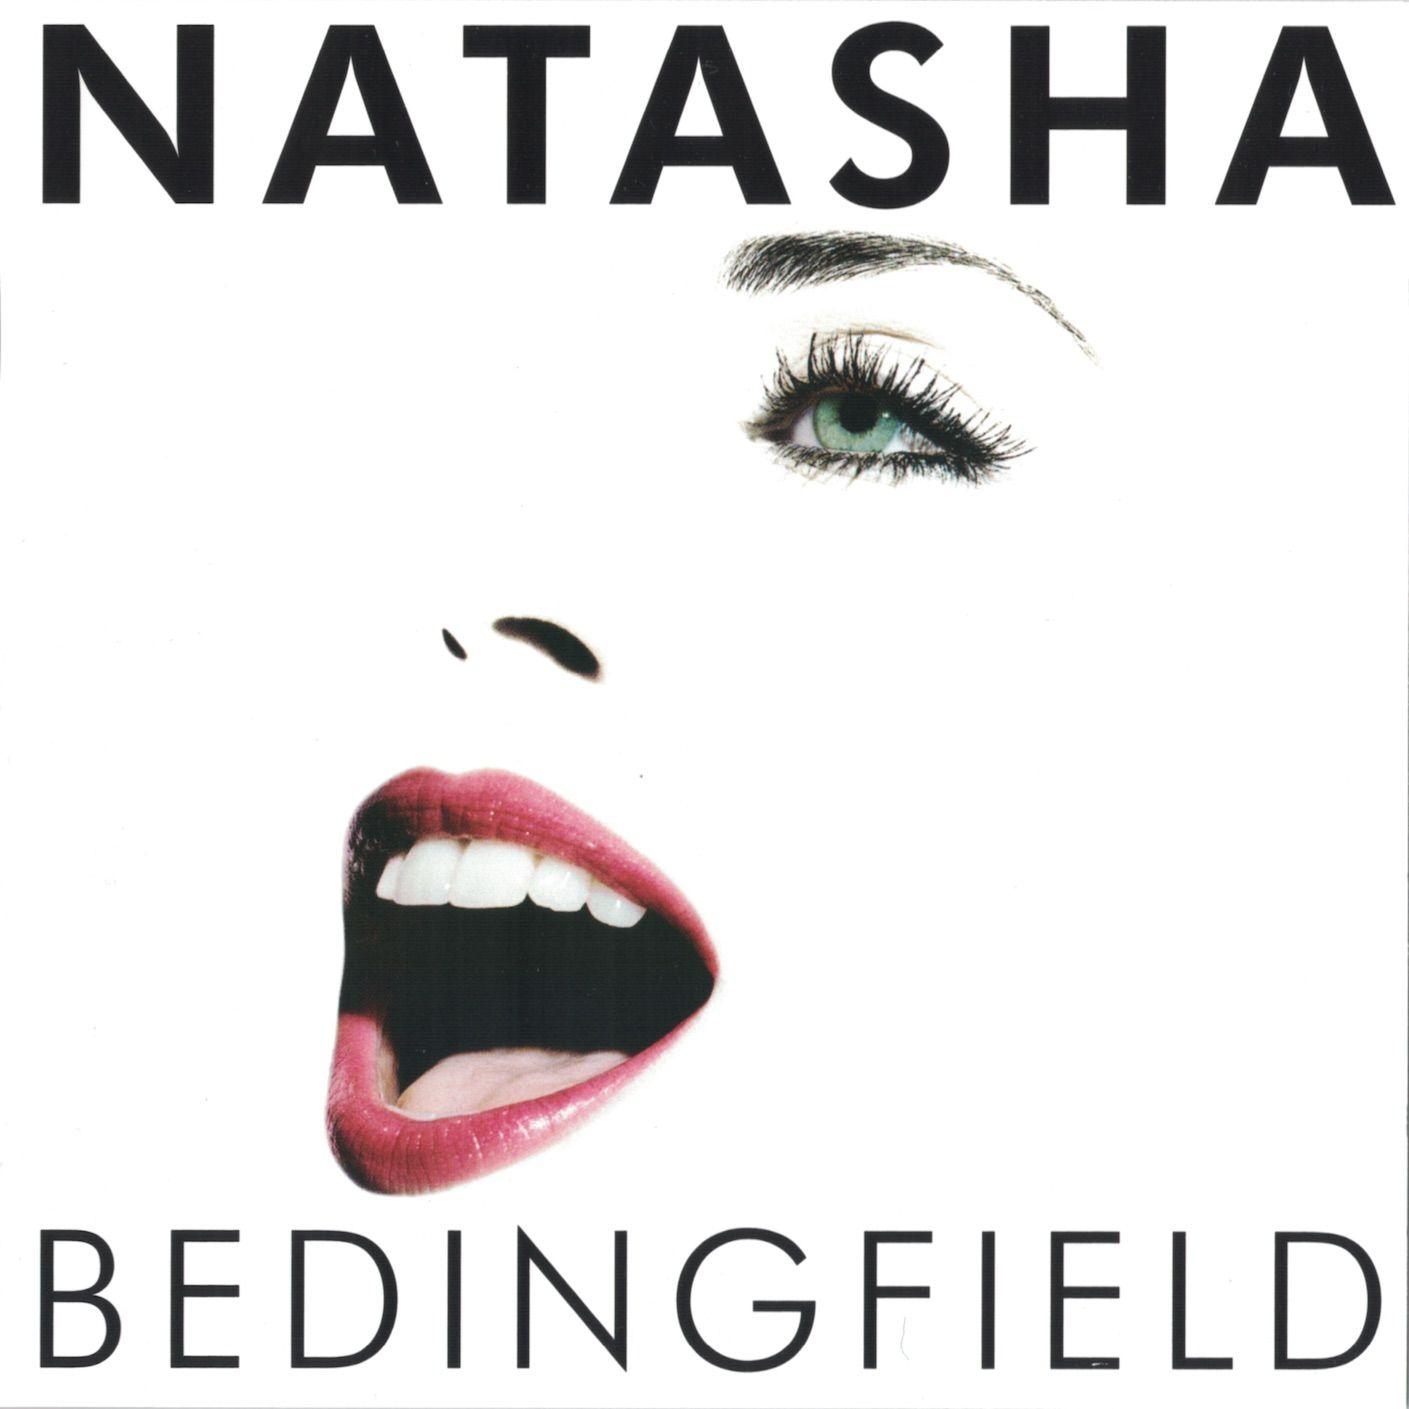 Natasha Bedingfield - Nb album cover